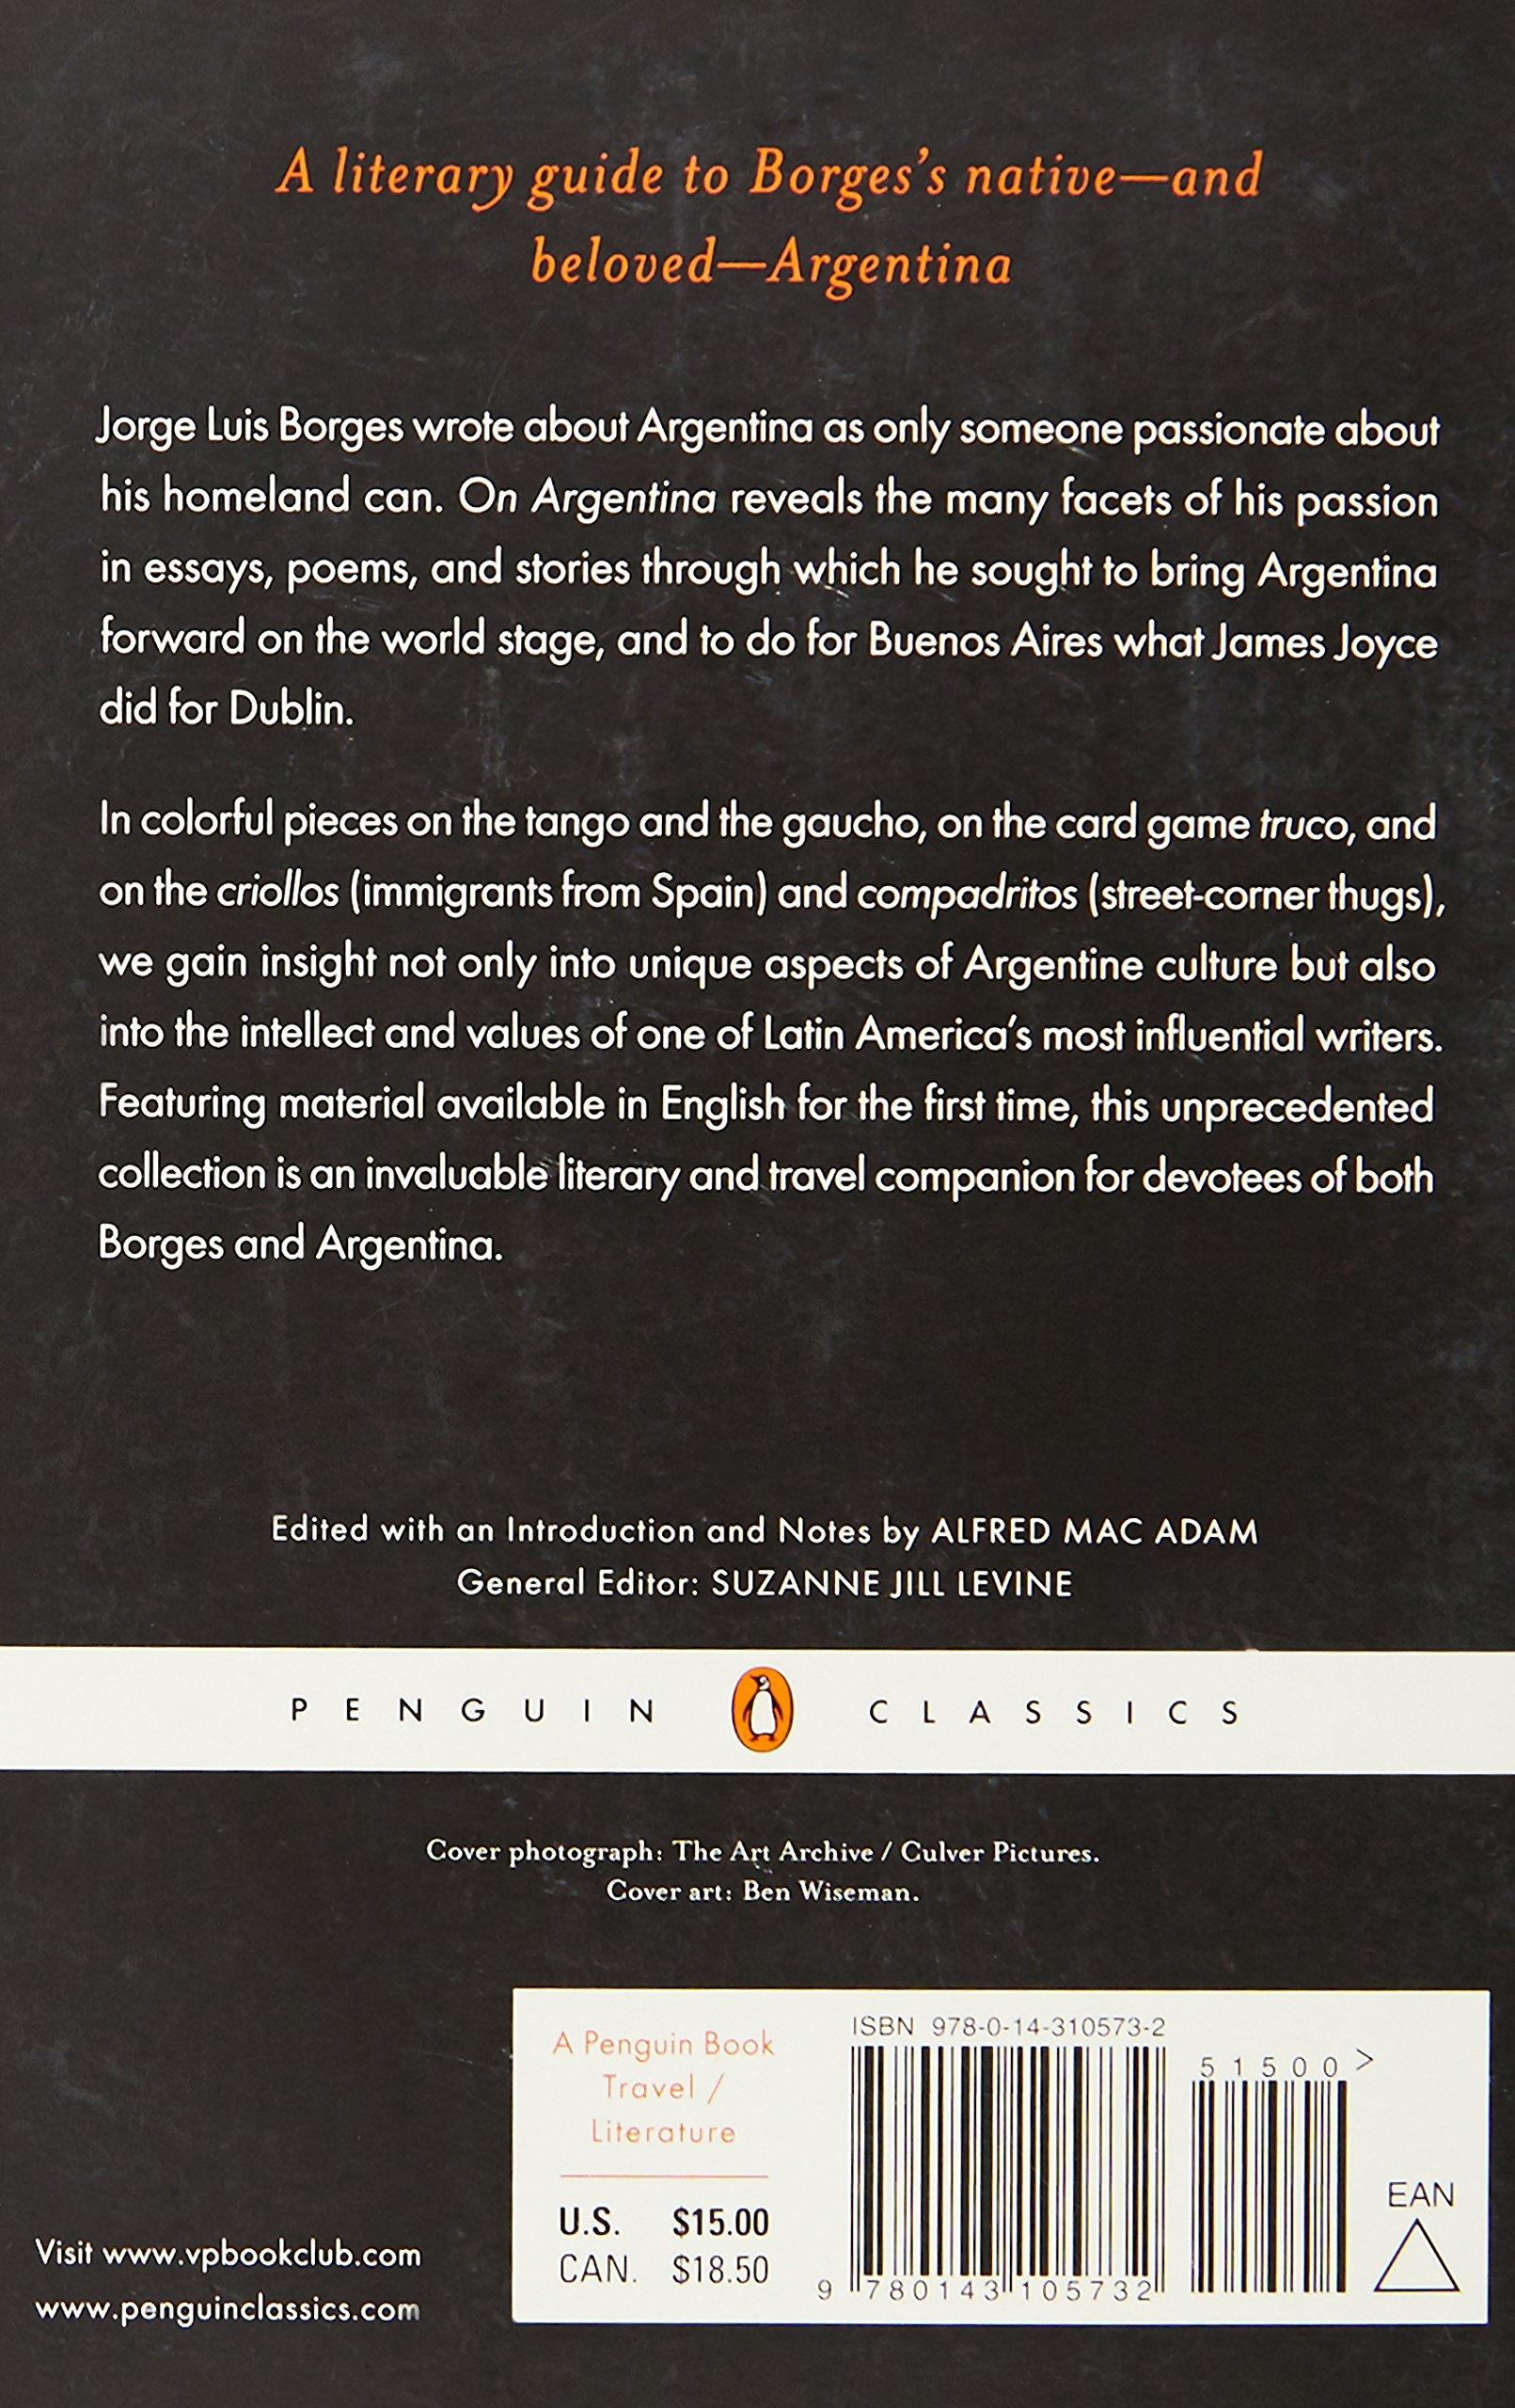 on penguin classics jorge luis borges suzanne jill on penguin classics jorge luis borges suzanne jill levine alfred mac adam 9780143105732 com books